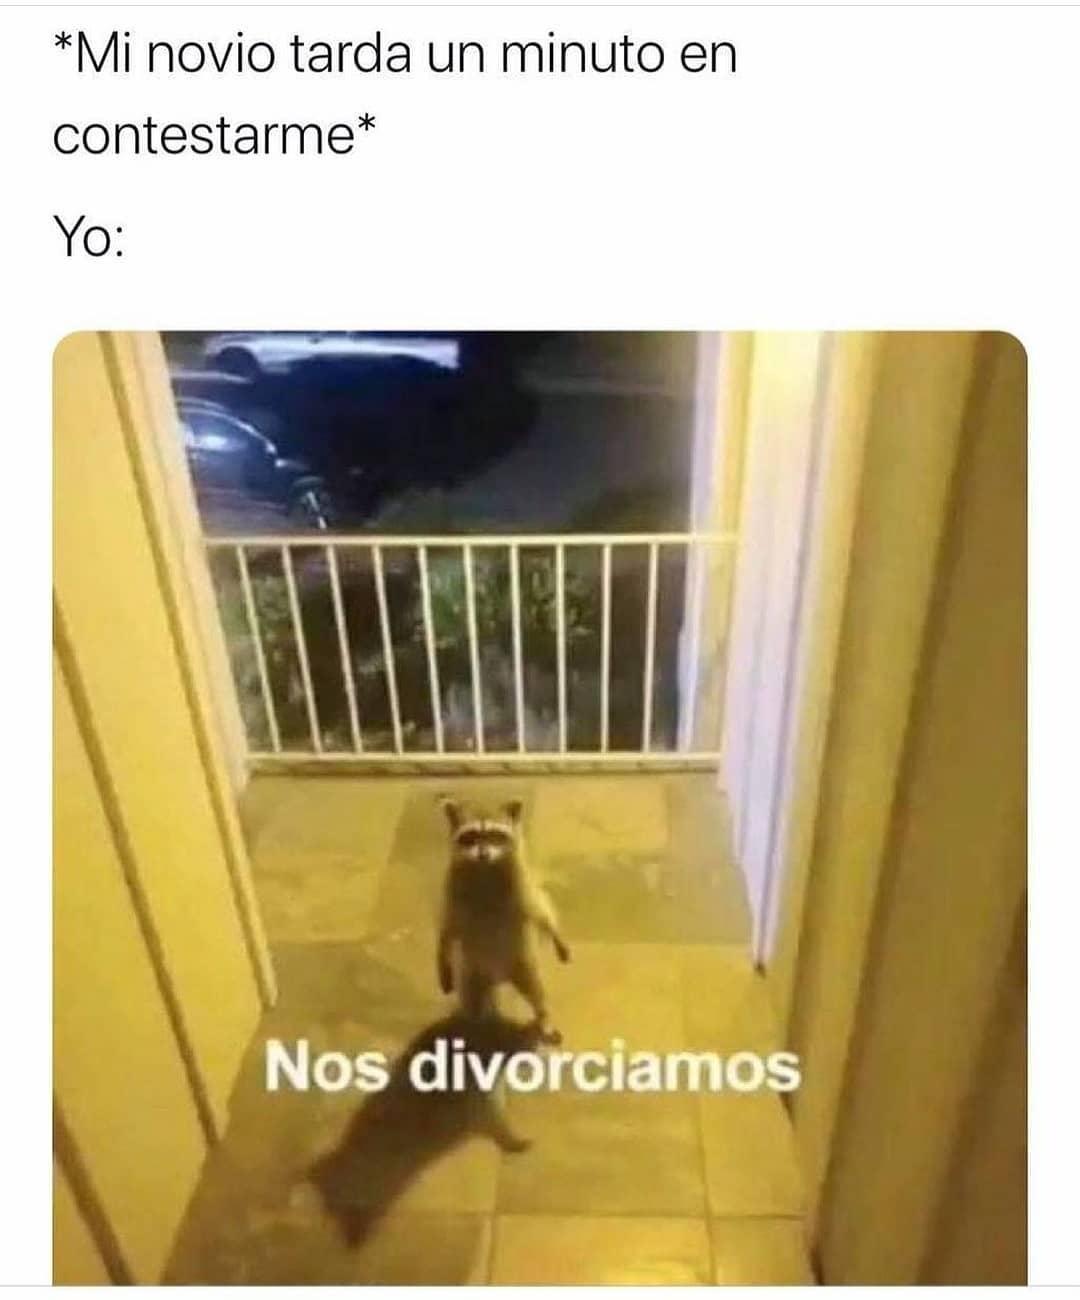 *Mi novio tarda un minuto en contestarme*  Yo: Nos divorciamos.